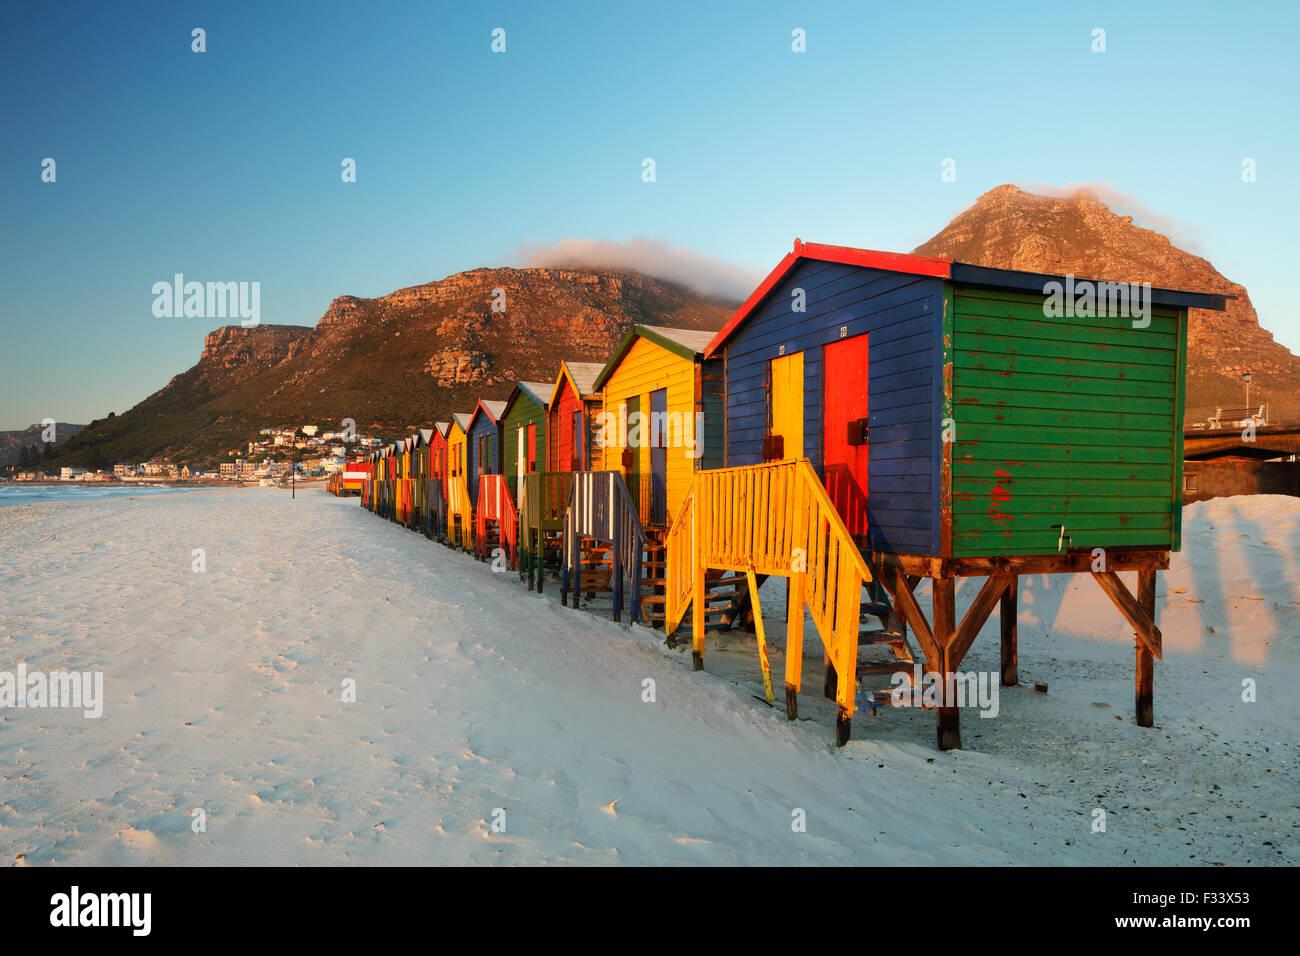 Strandhütten in Muizenberg, Western Cape, Südafrika Stockfoto